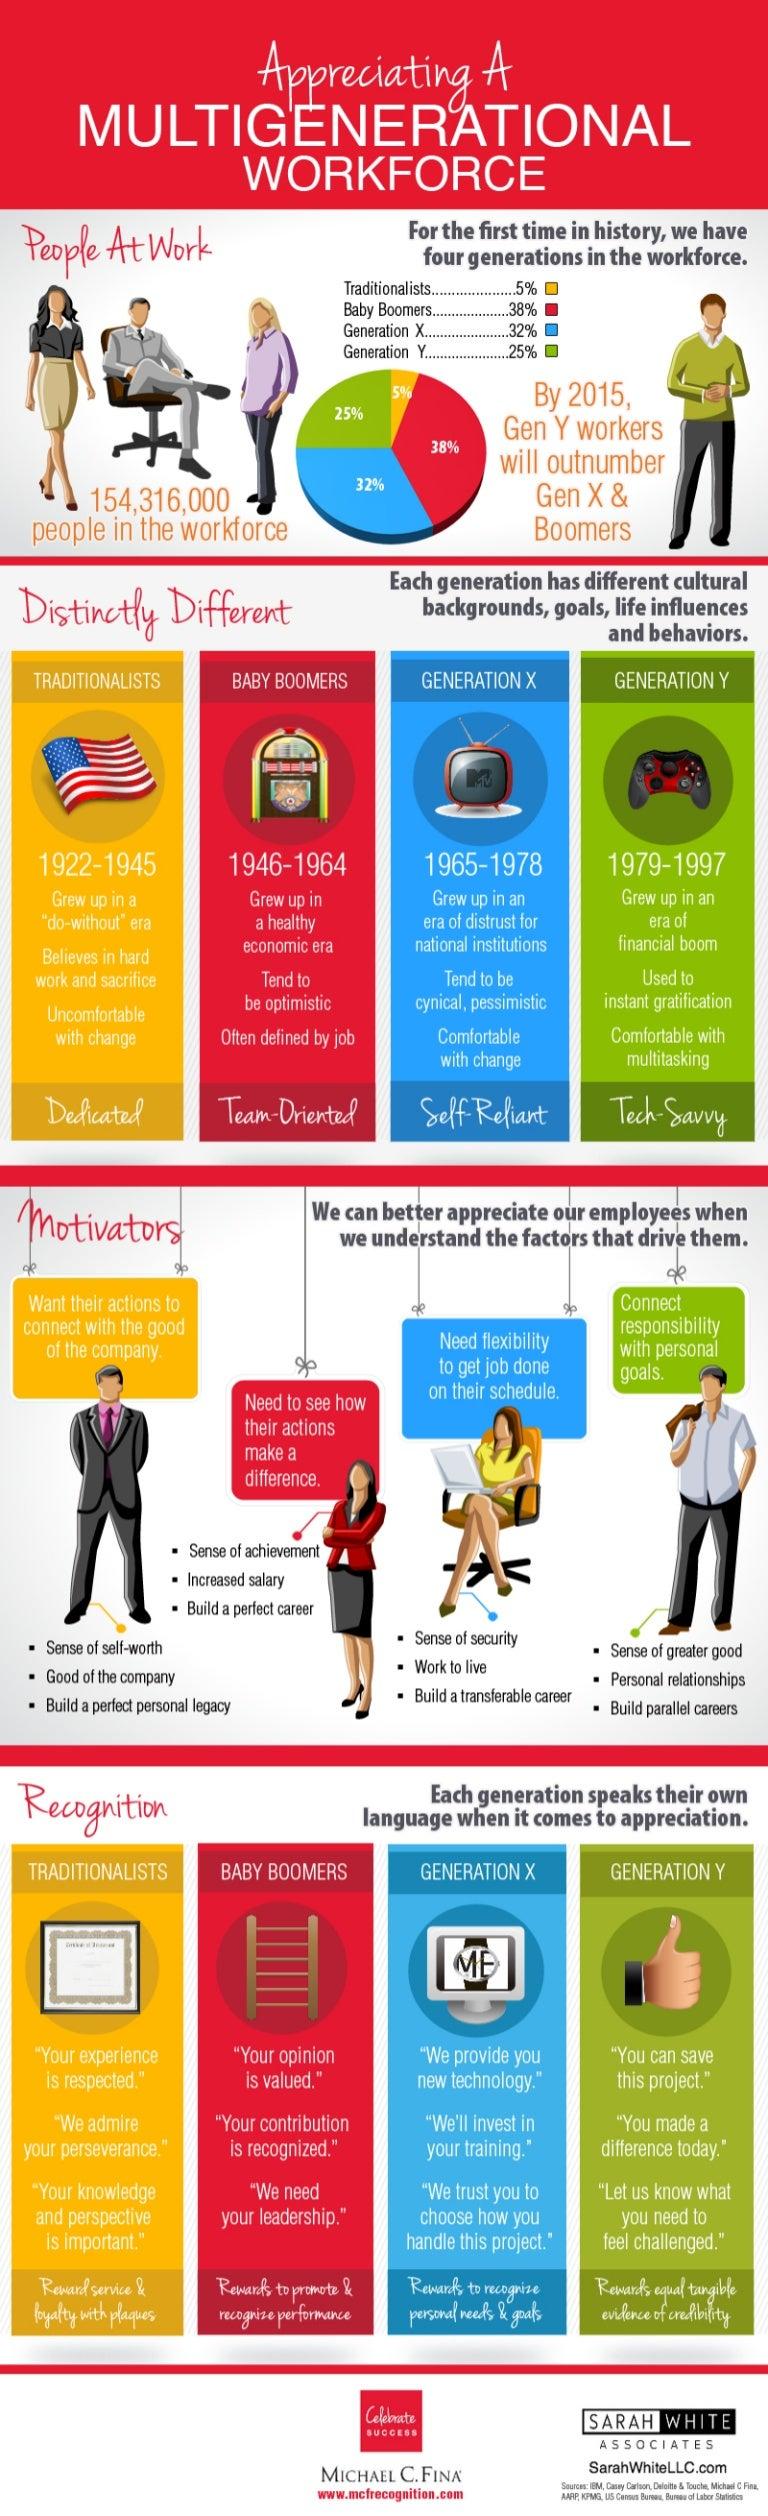 multigenerational workforce infographic